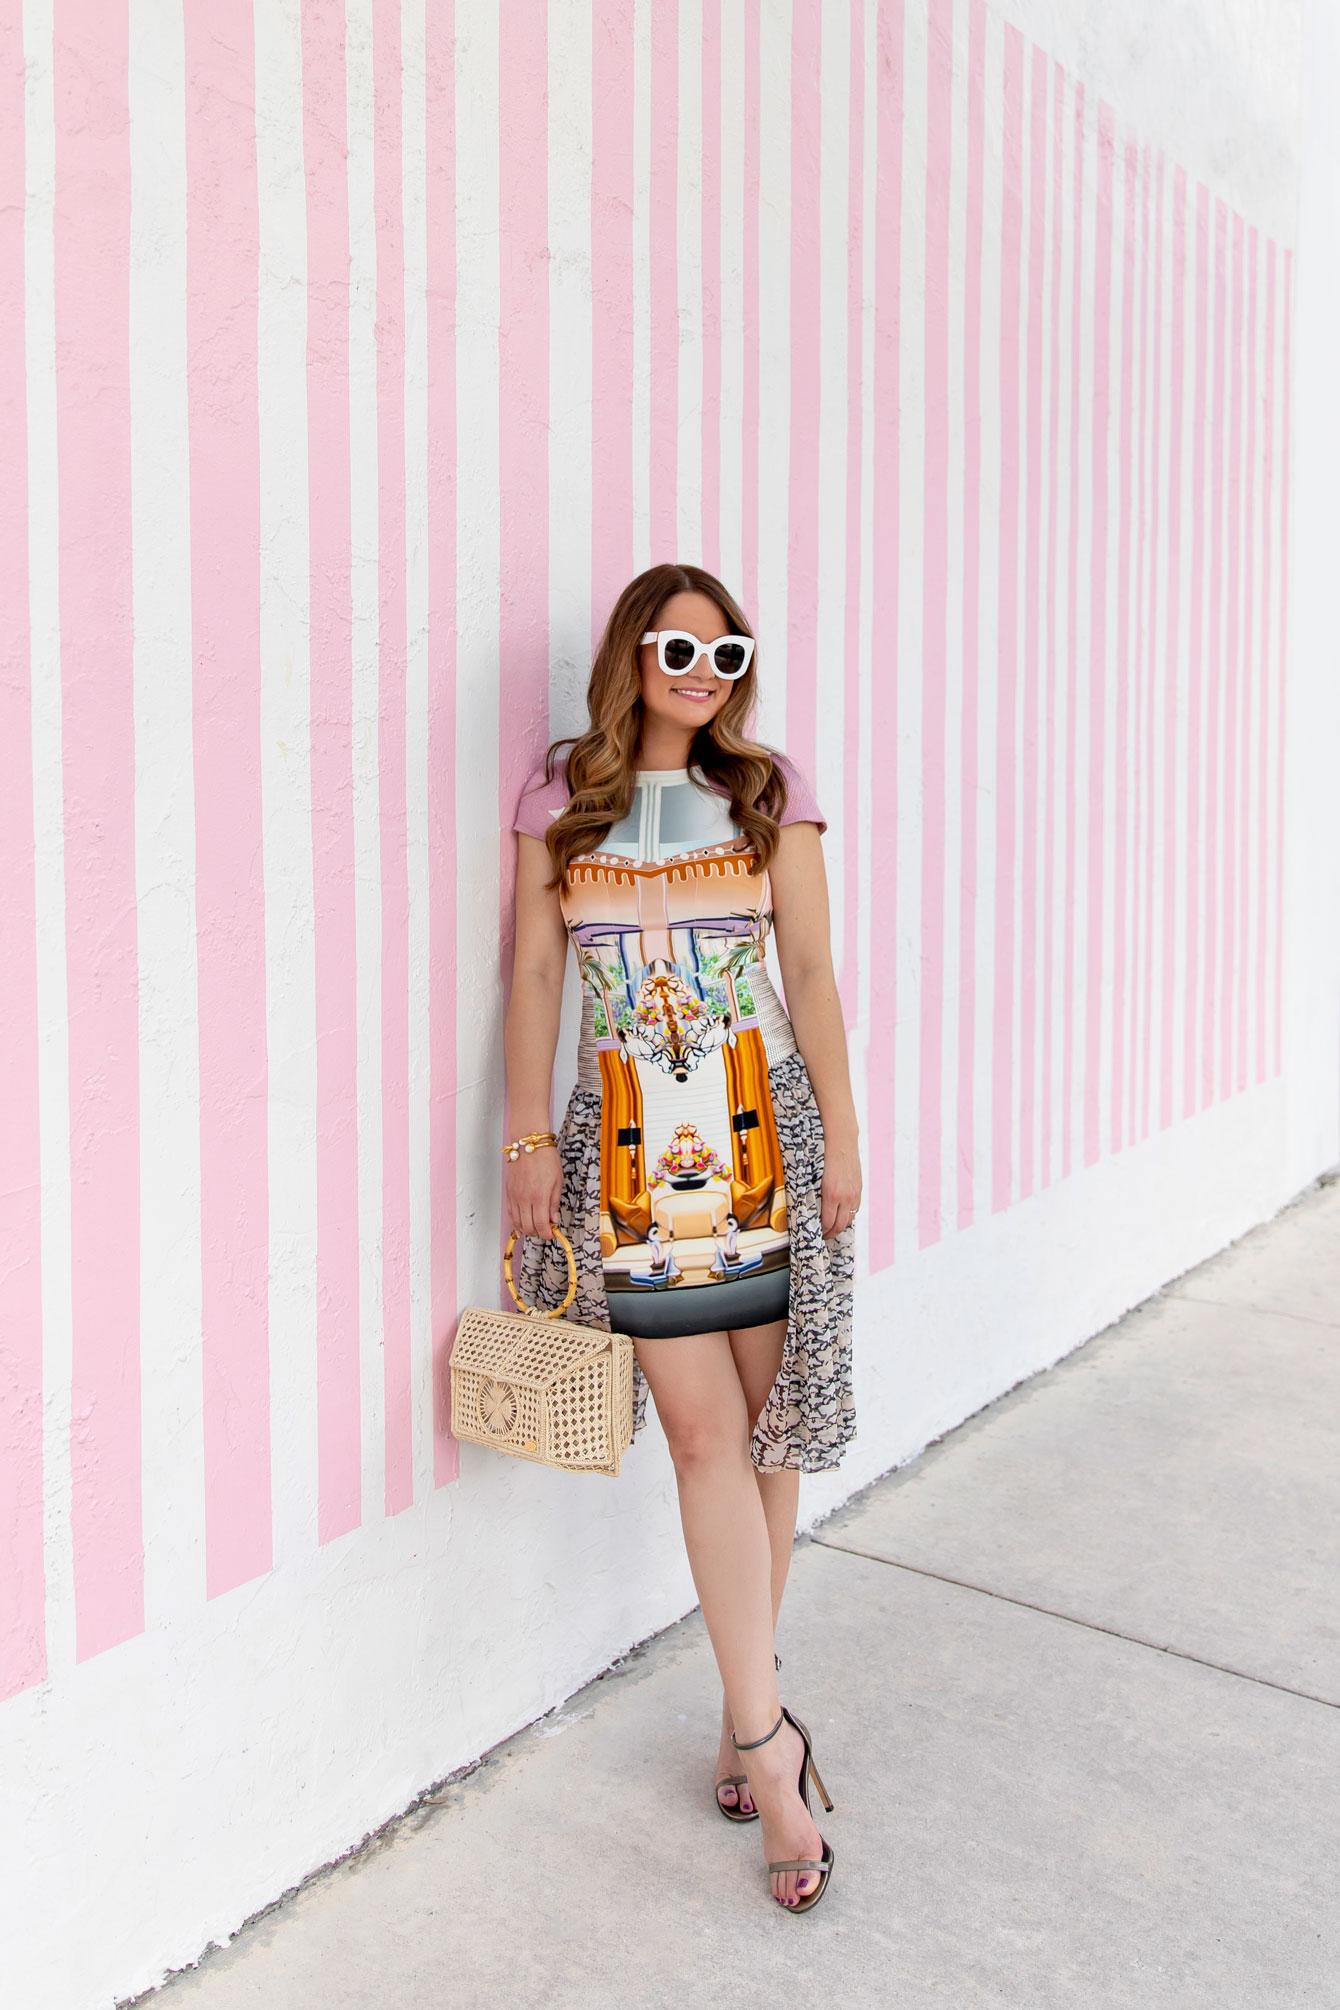 Pink Stripe Wall Miami